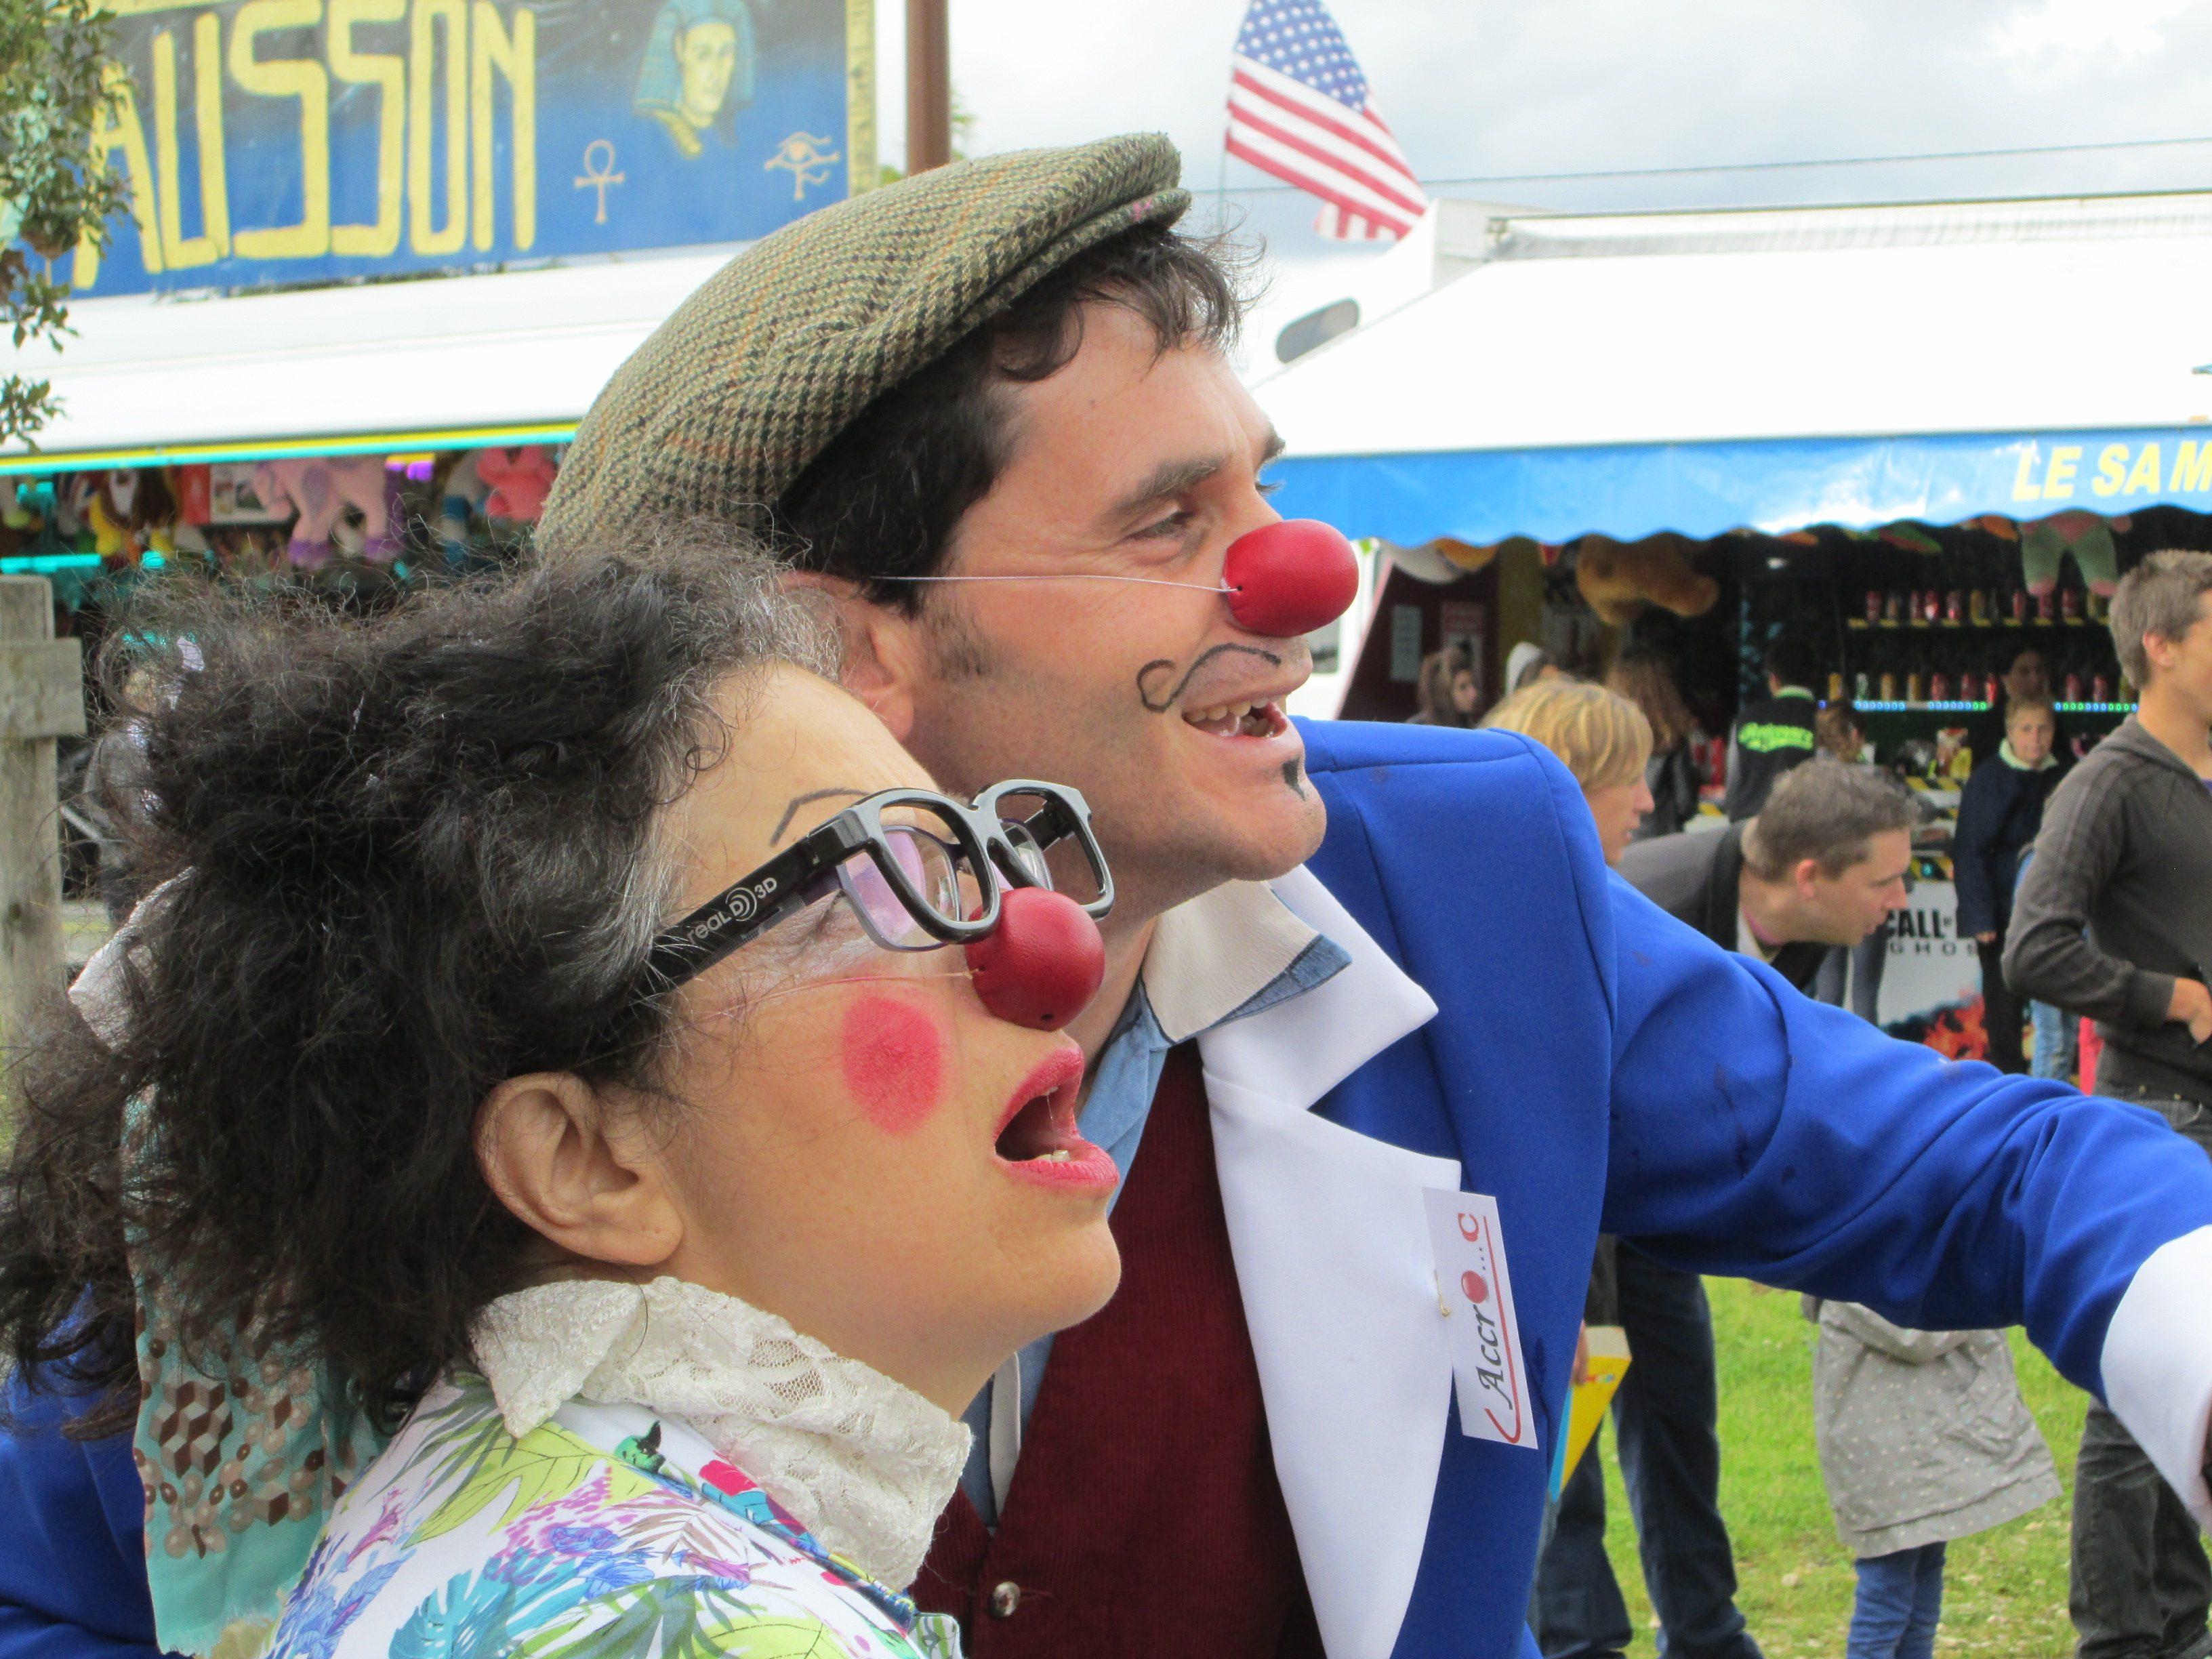 Mon clown et moi, émoi